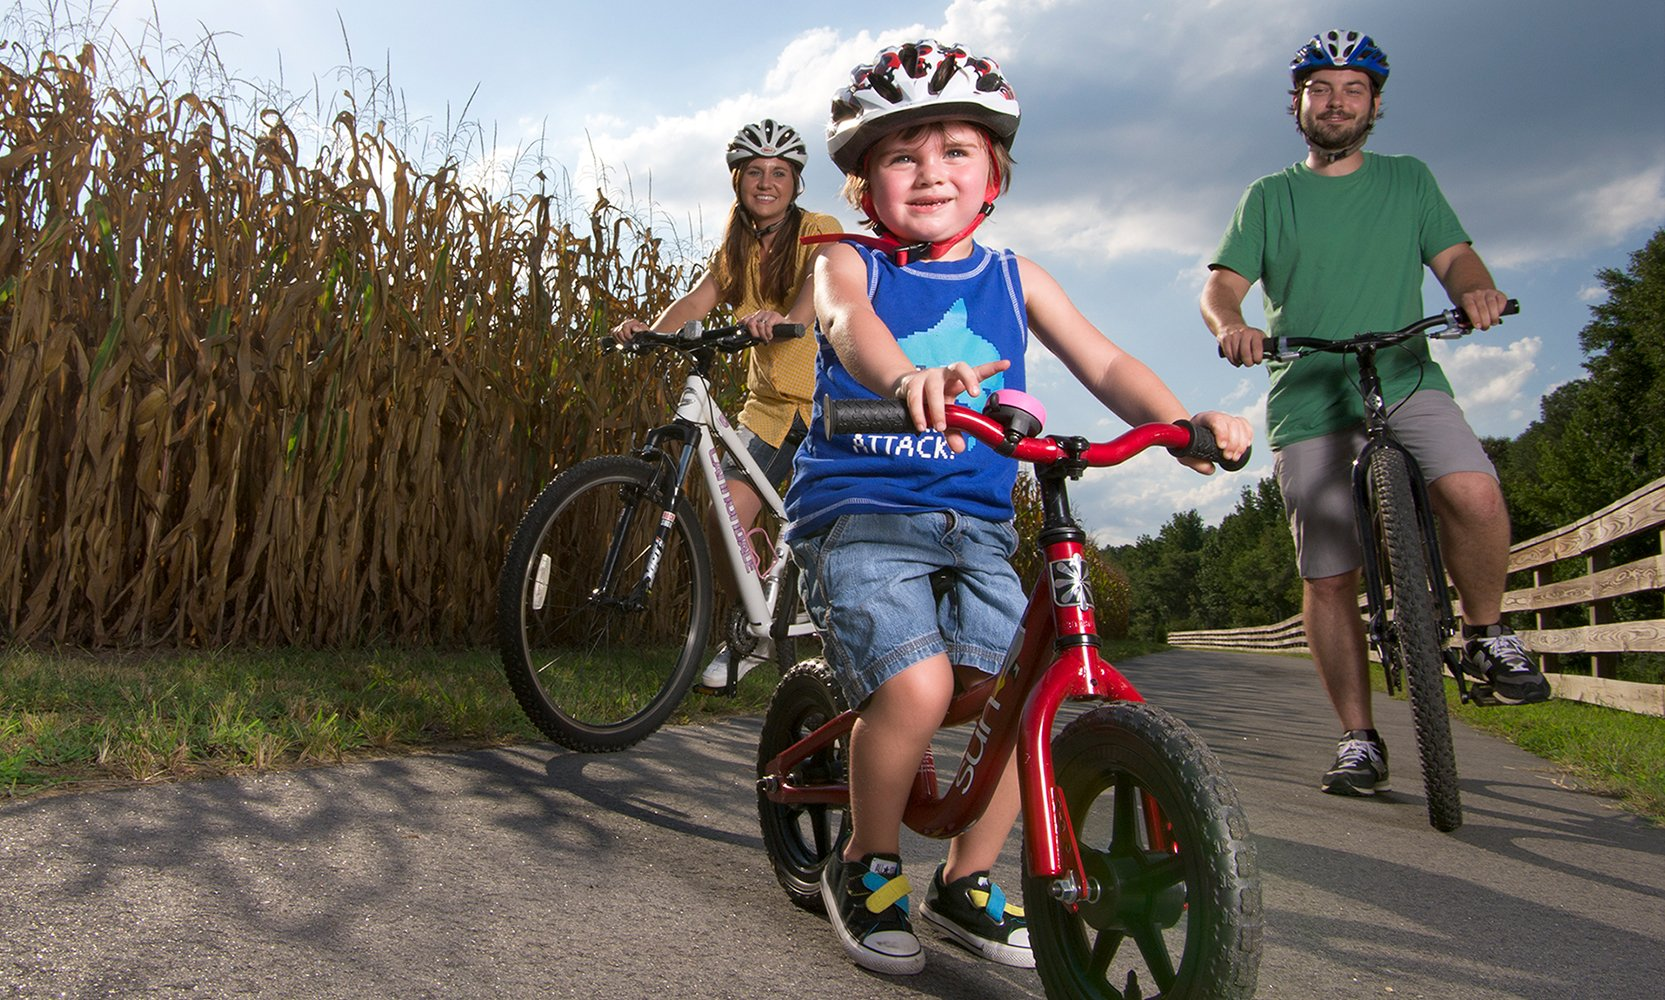 Bike, run or walk 400 years of history on the Virginia Capital Trail.